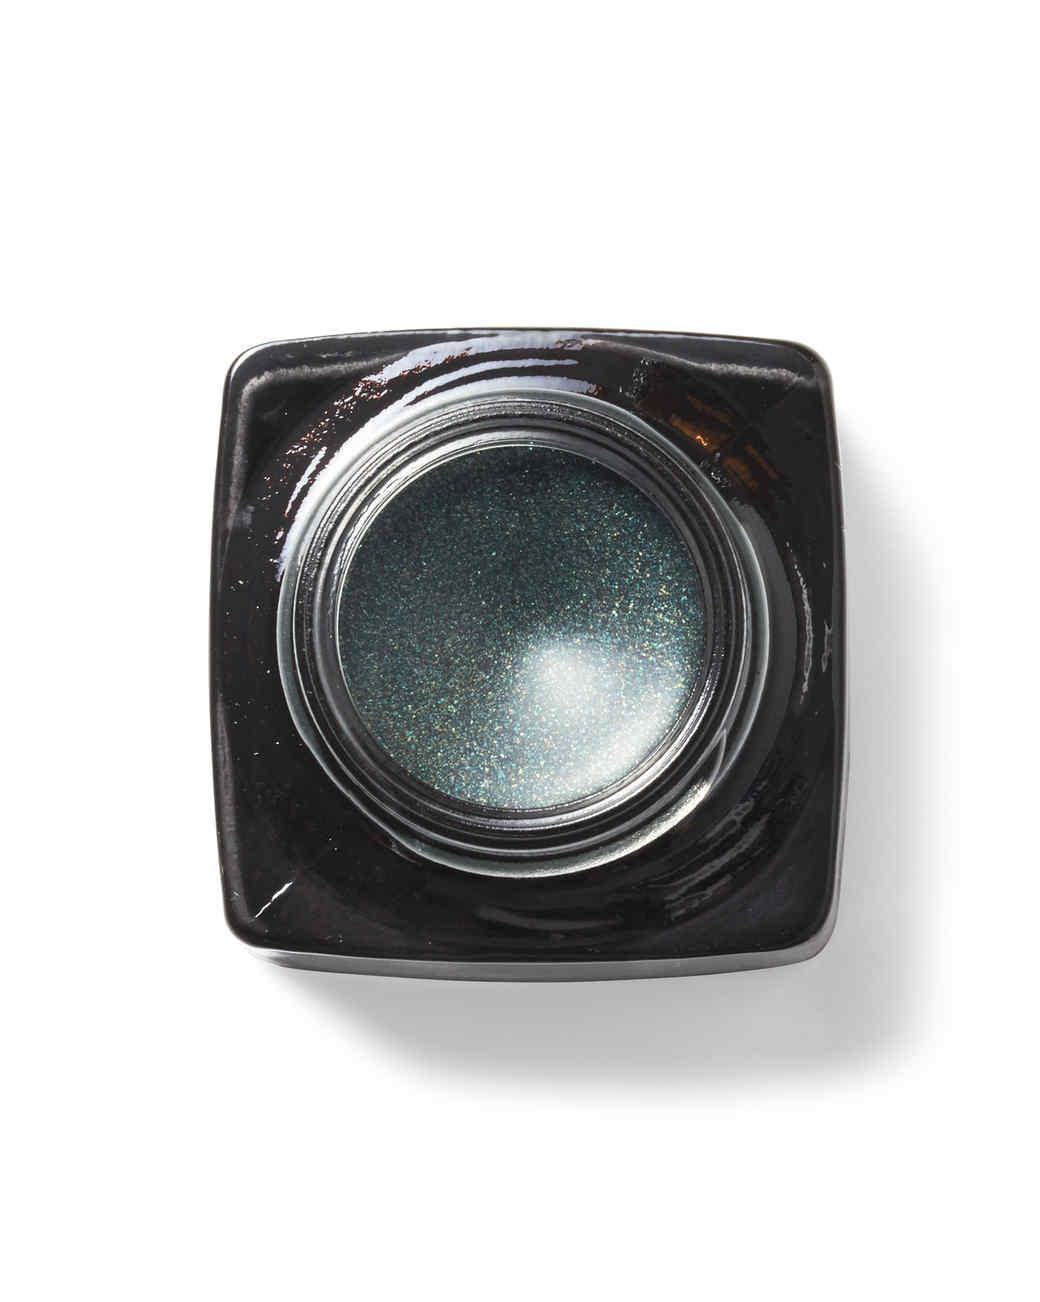 bobbi-brown-gel-shadow-green-098-d111801.jpg